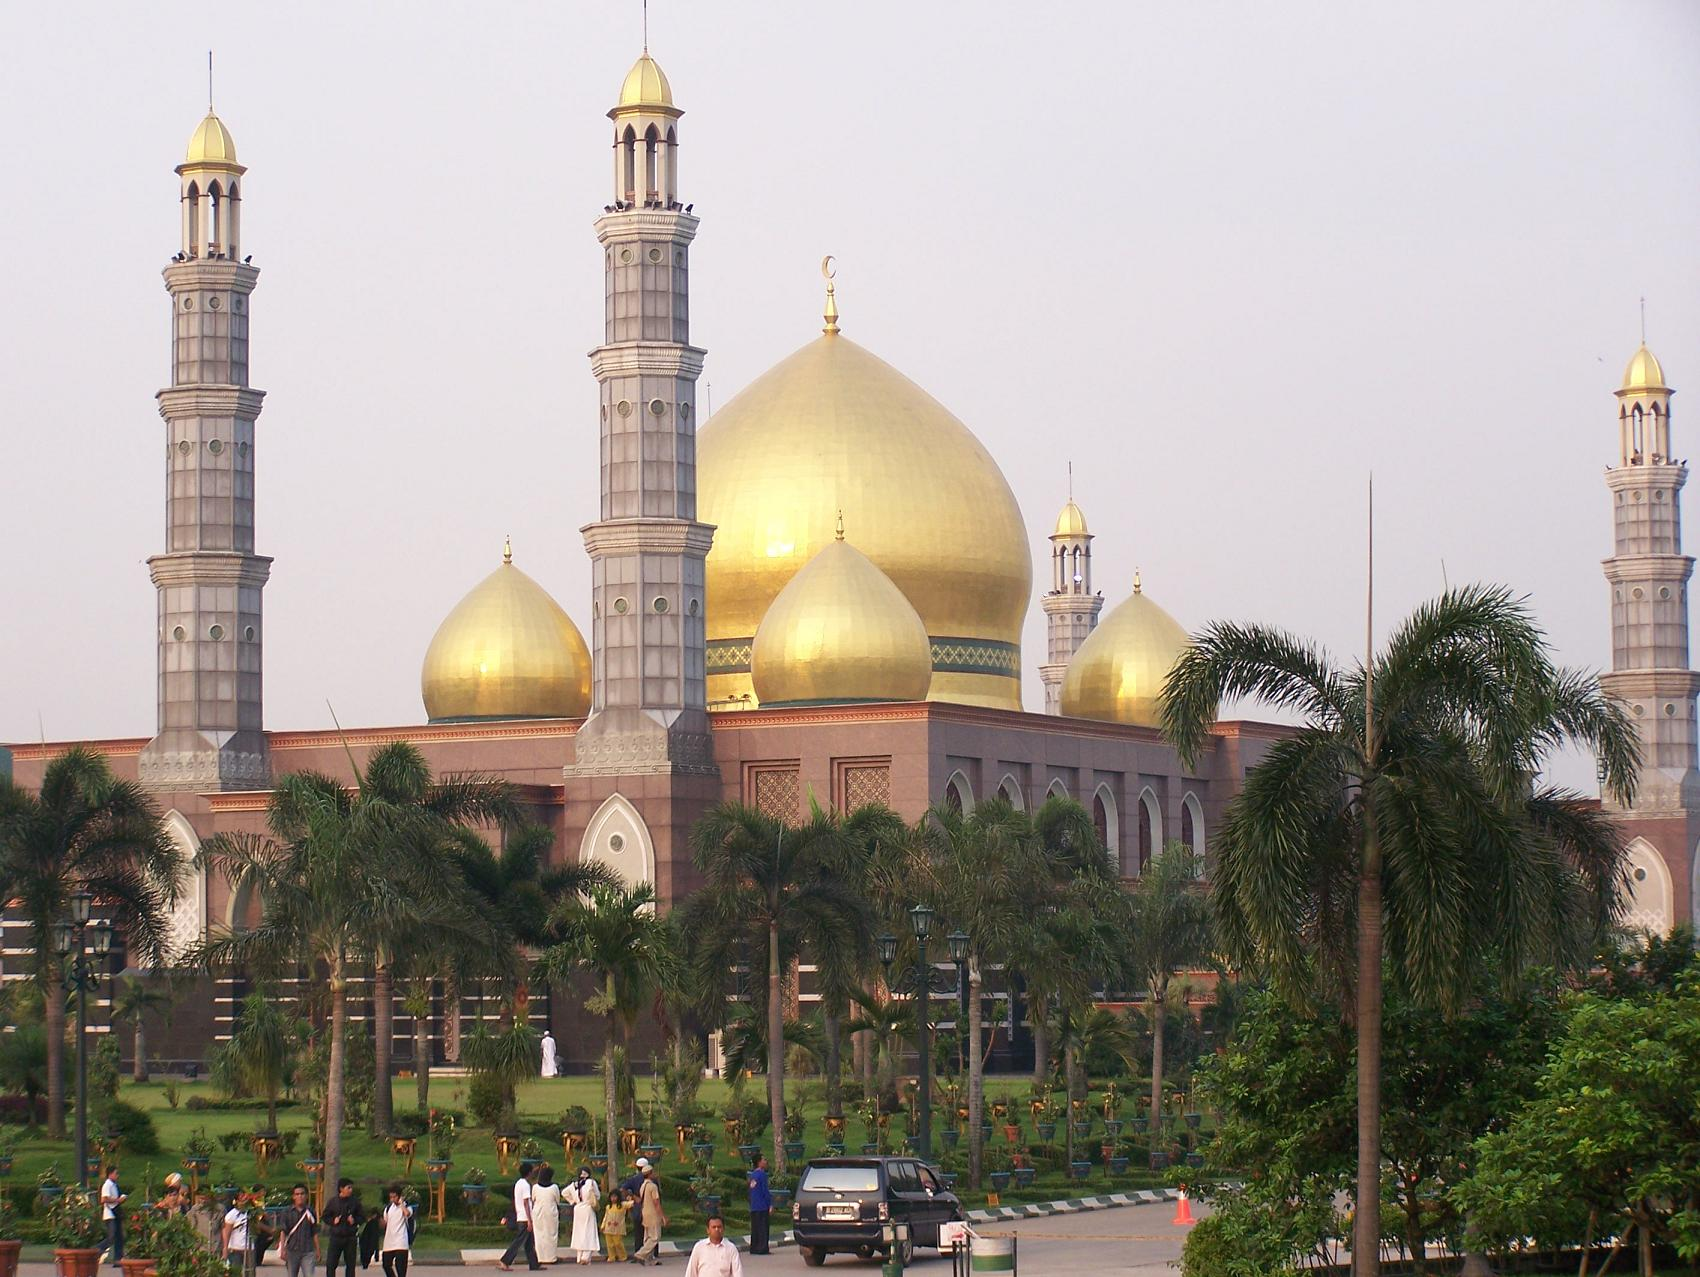 http://rizaldp.files.wordpress.com/2009/07/masjid-dian-al-mahri.jpg